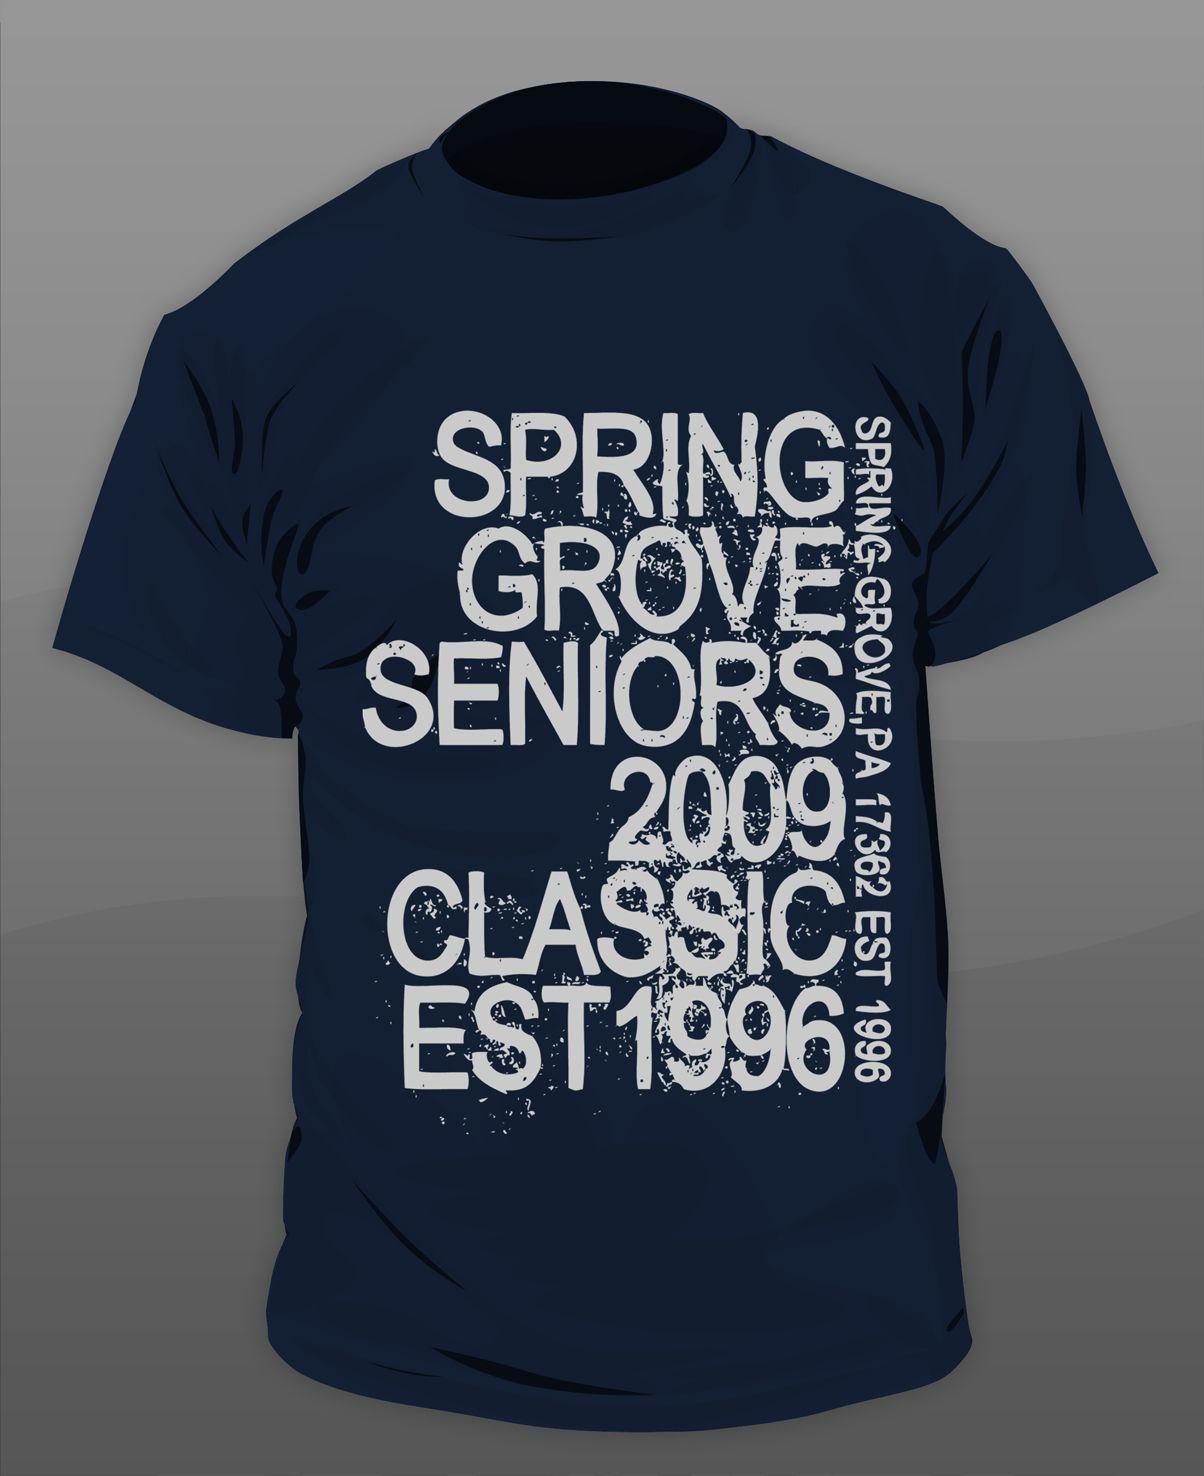 Senior t shirts senior class t shirts designs http gkgfx deviantart